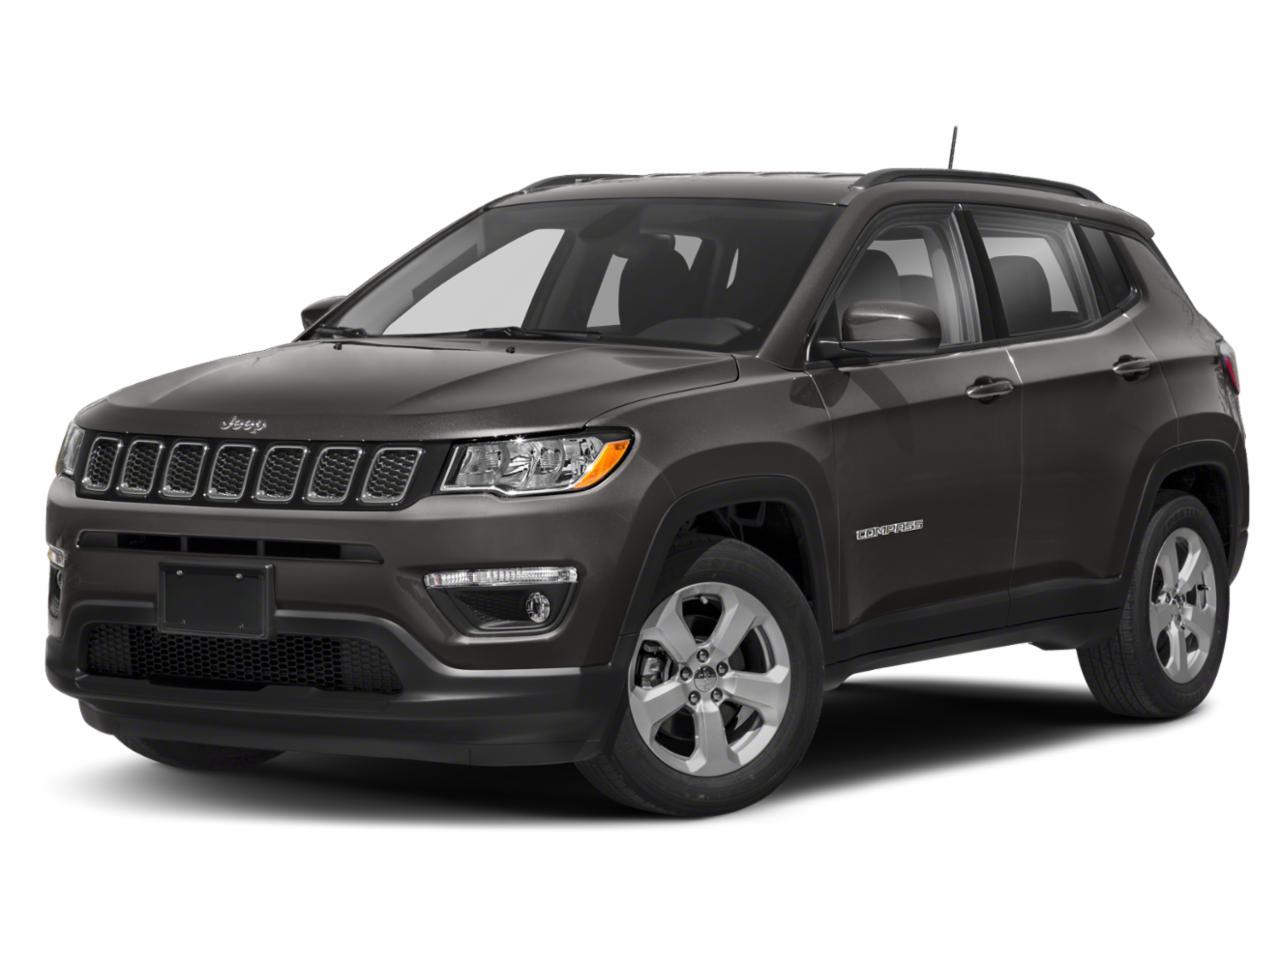 2019 Jeep Compass Vehicle Photo in CHAMPLAIN, NY 12919-0000